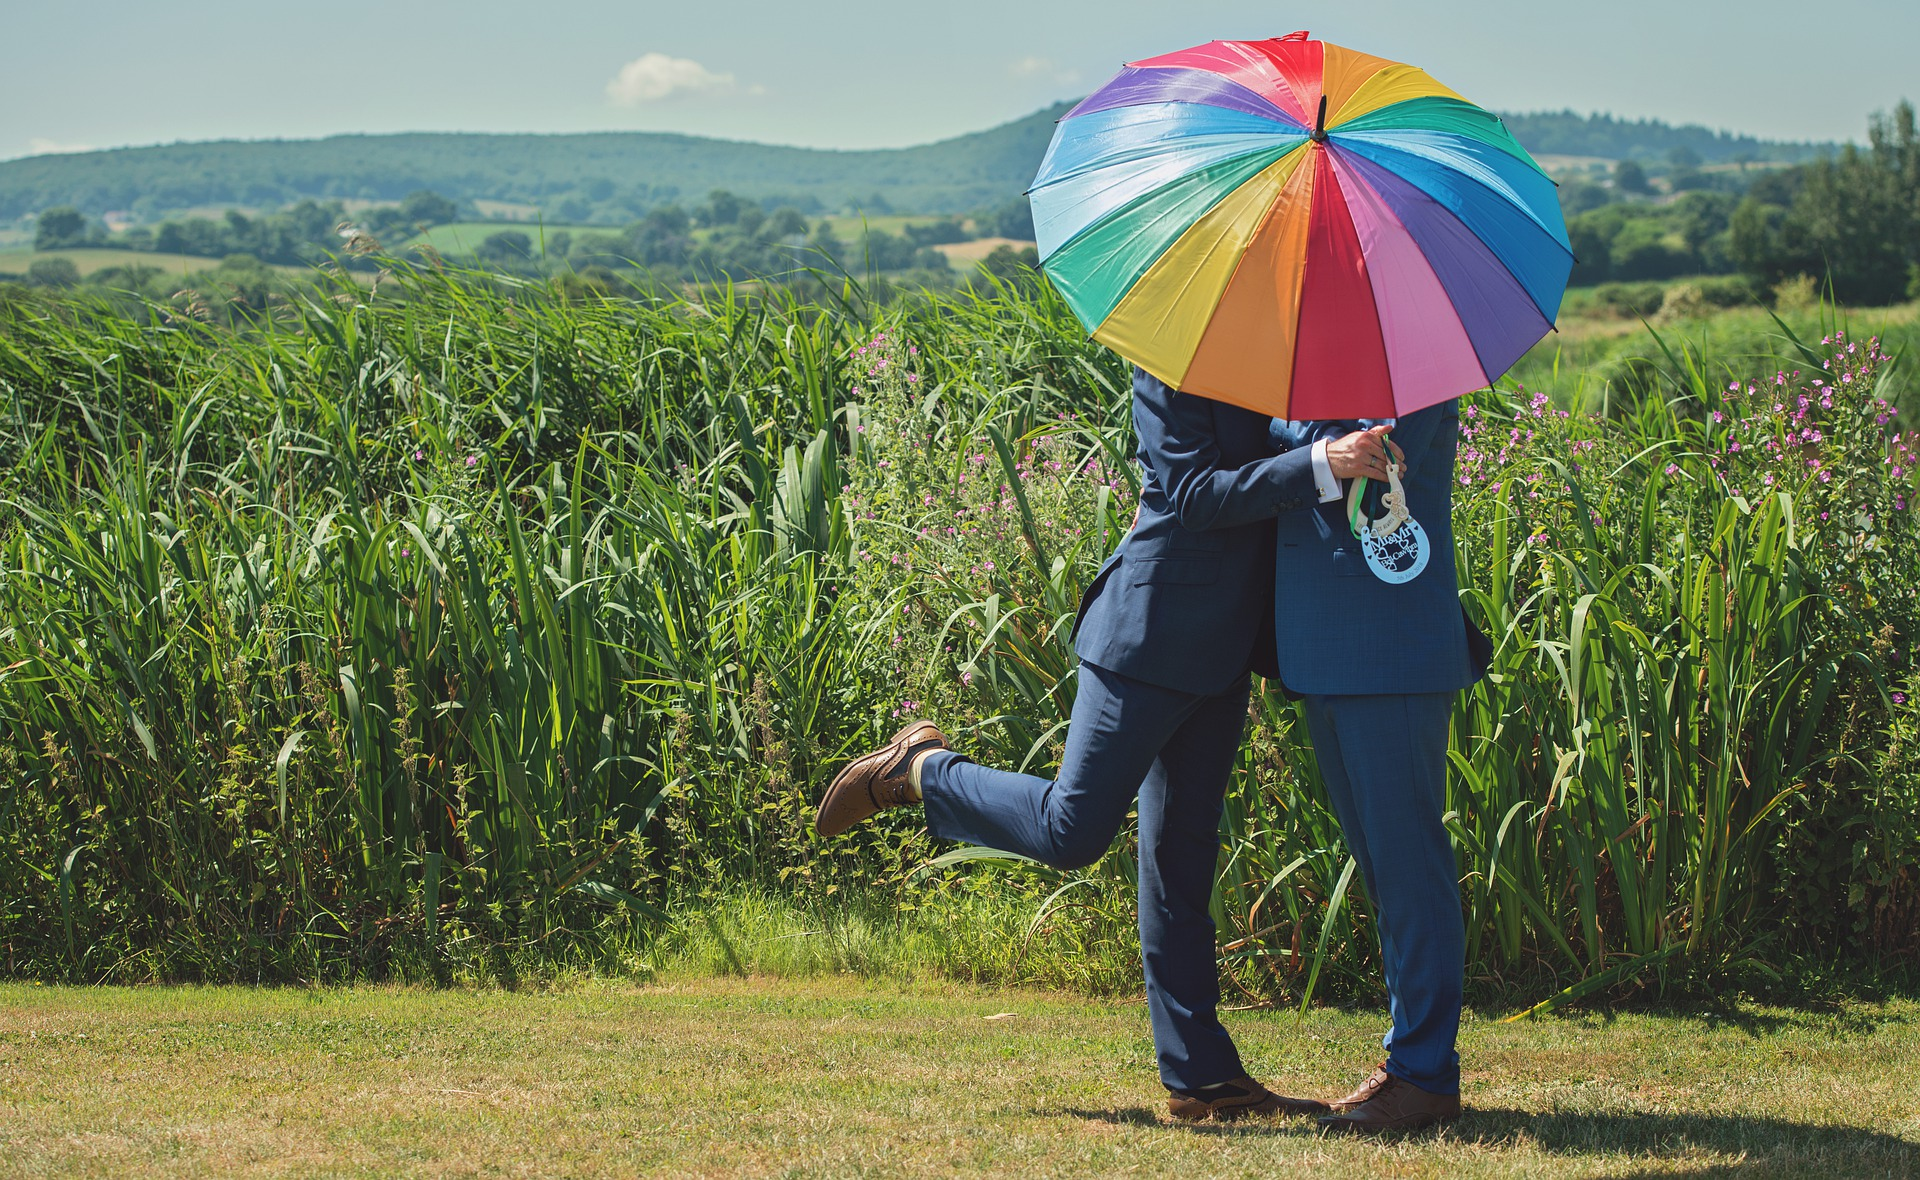 grooms kissing under rainbow umbrella